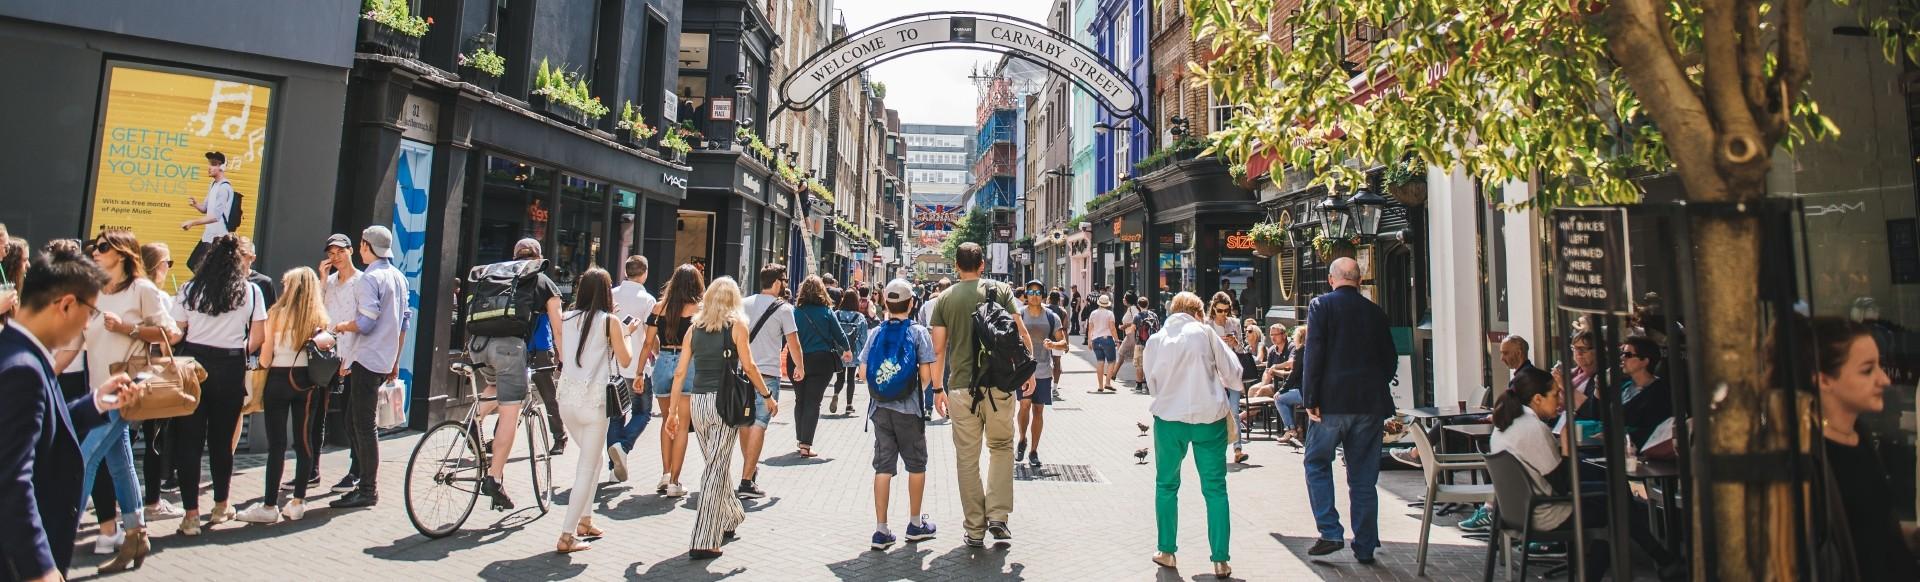 People walking past shops on London's Carnaby Street.